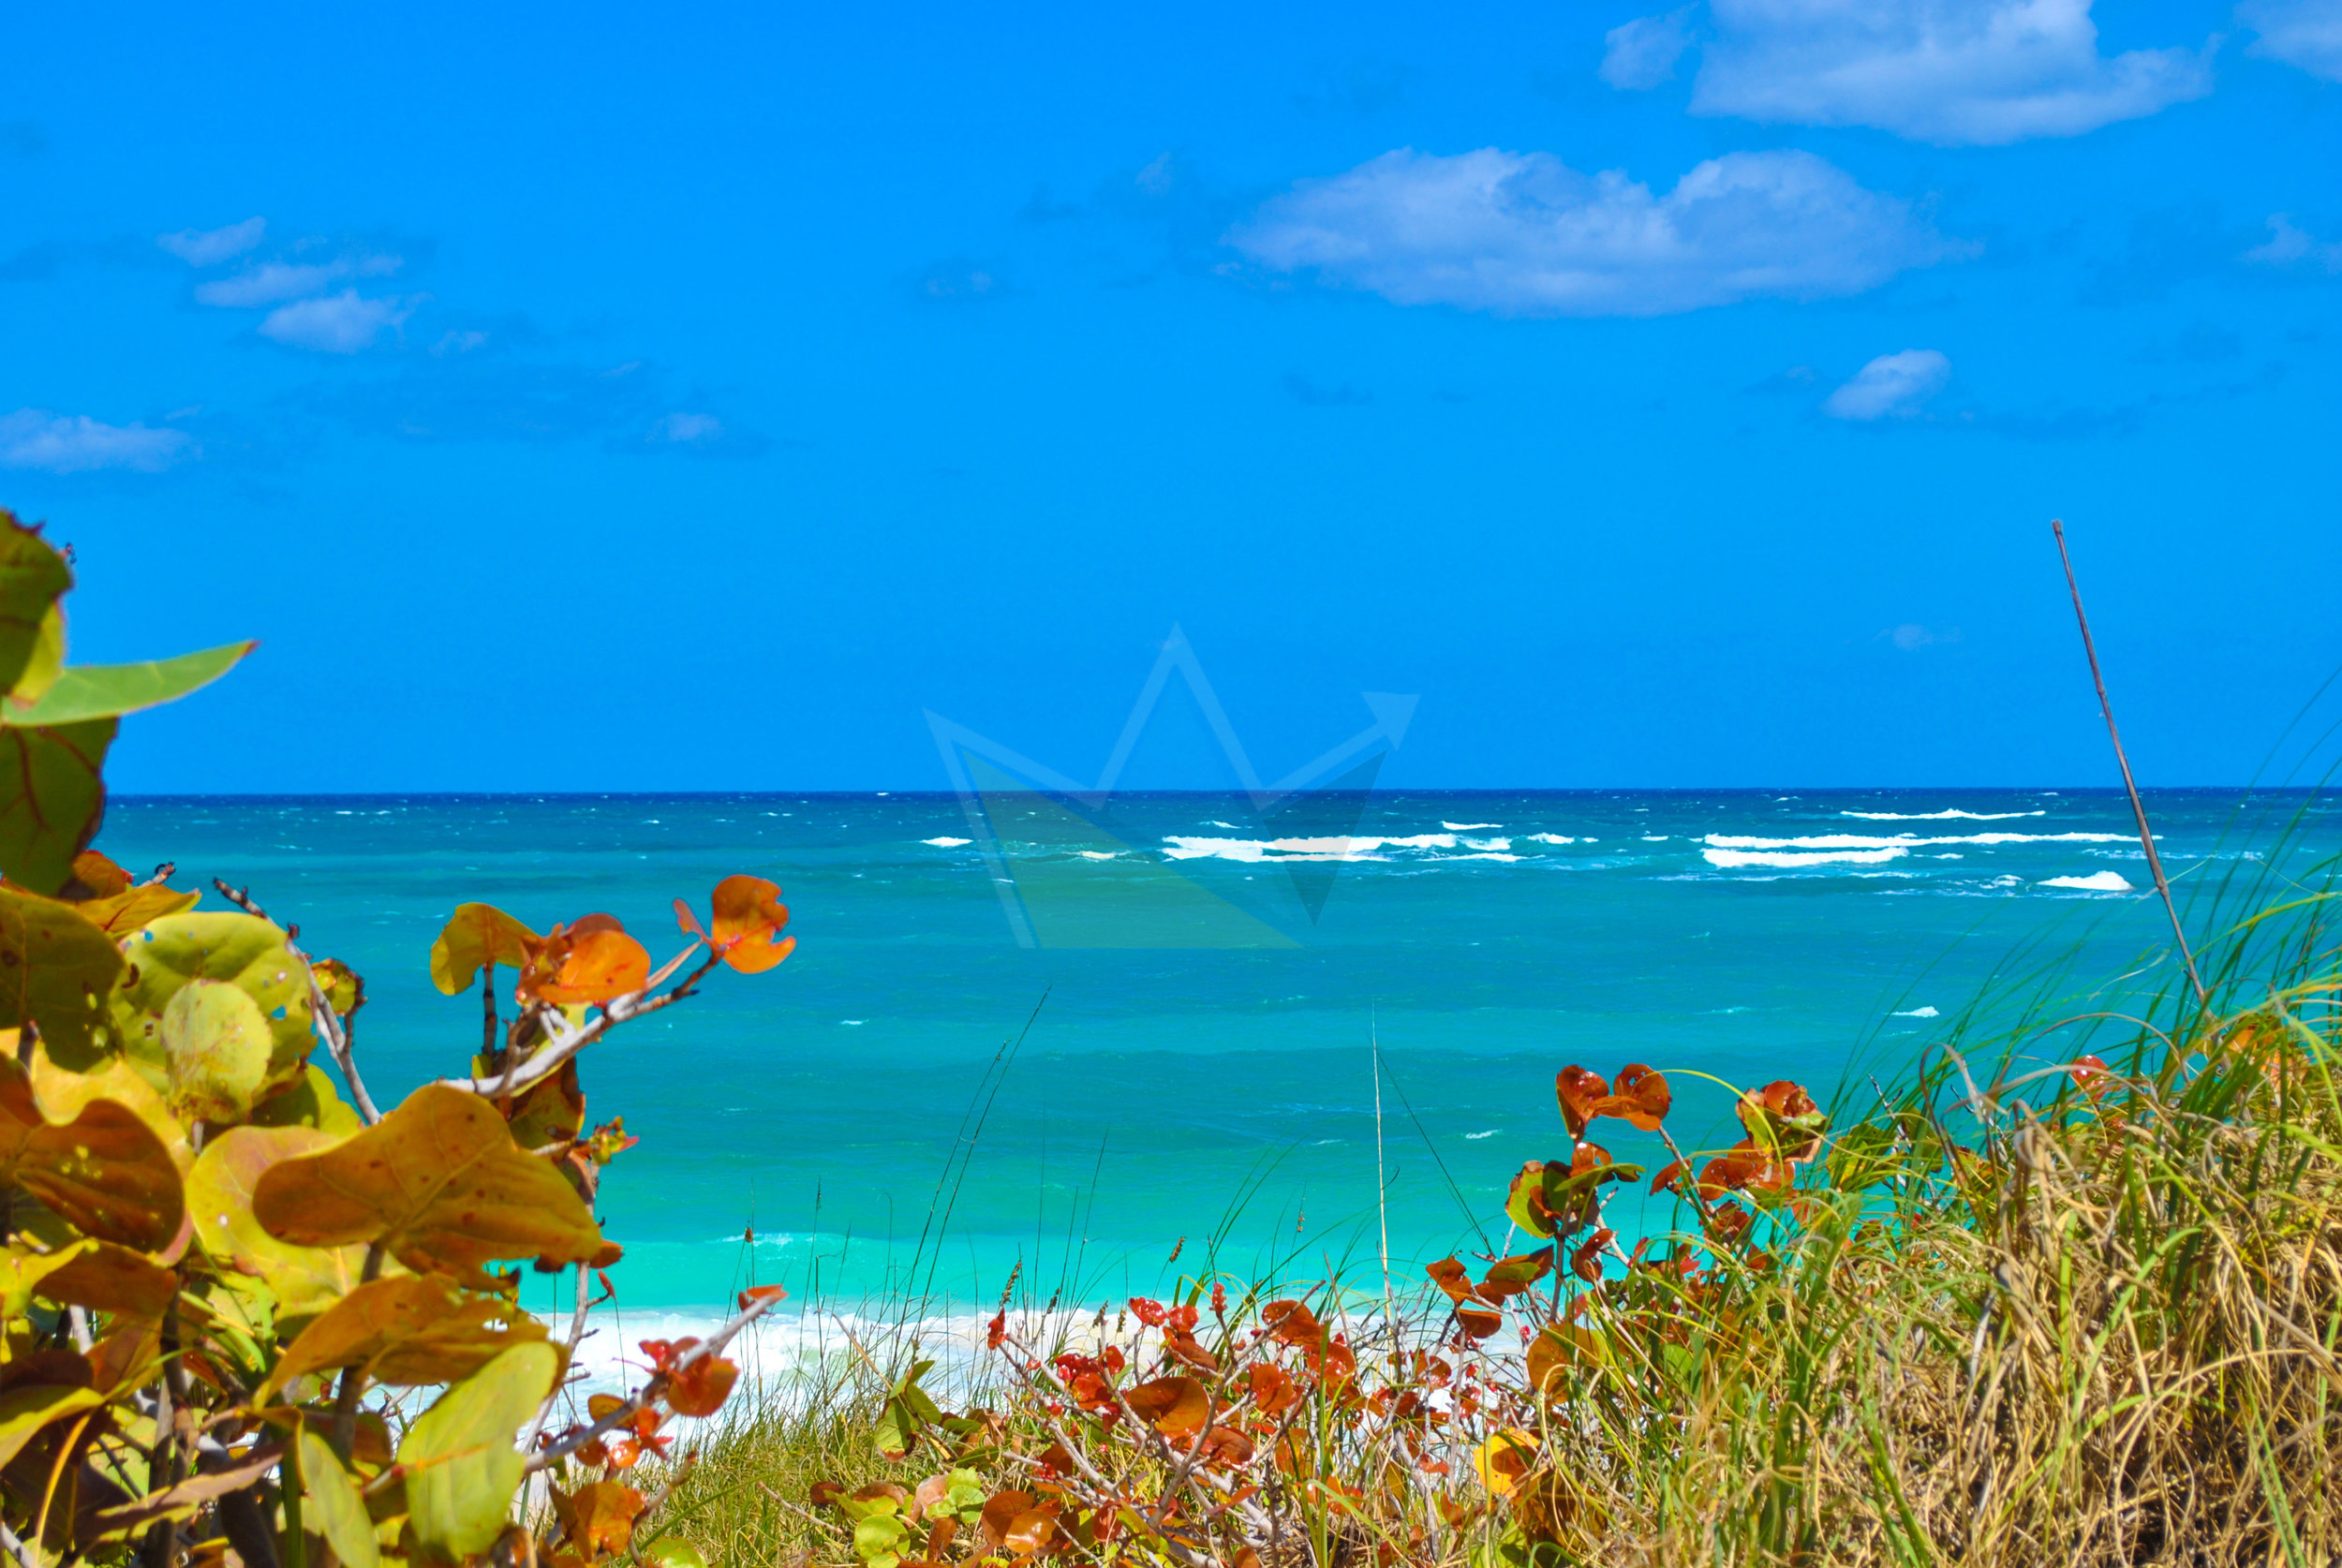 Tar Bay Beach, North Eleuthera